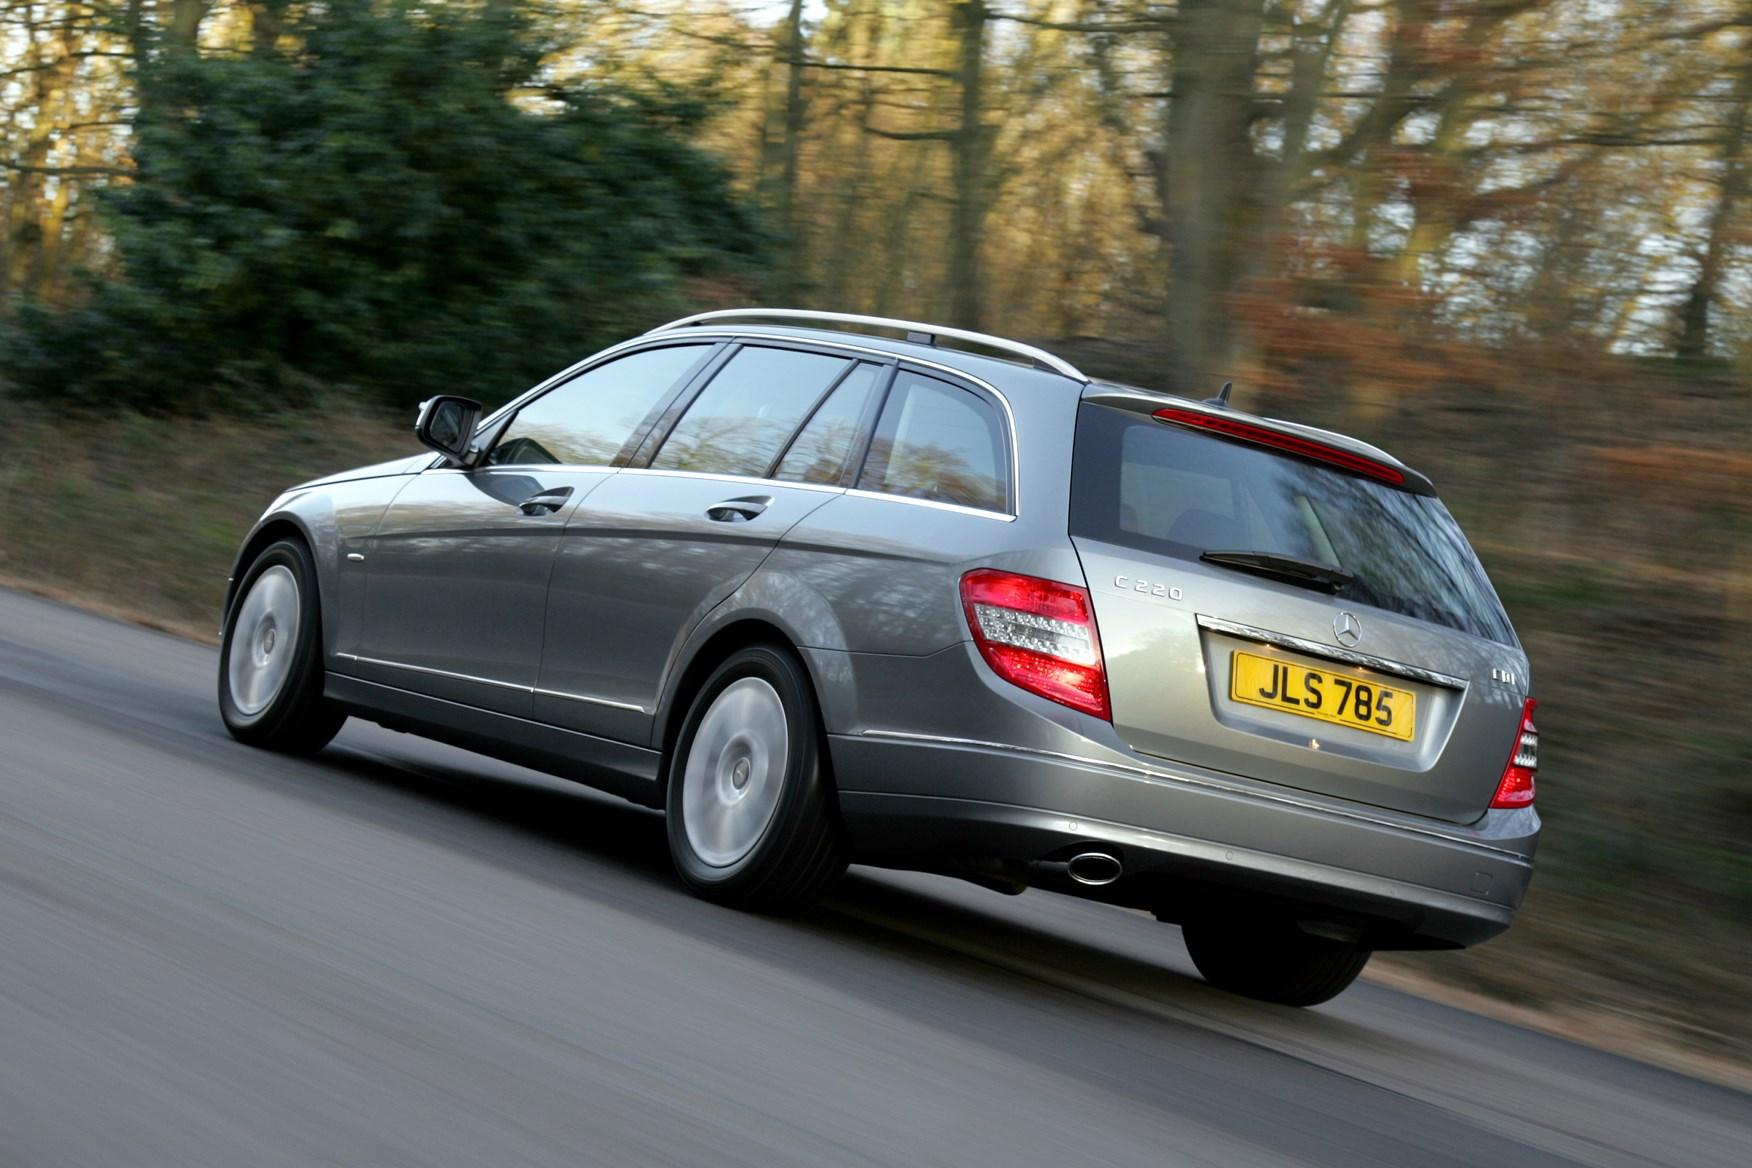 Mercedes benz c class estate 2008 2014 running costs for How much is a mercedes benz c class